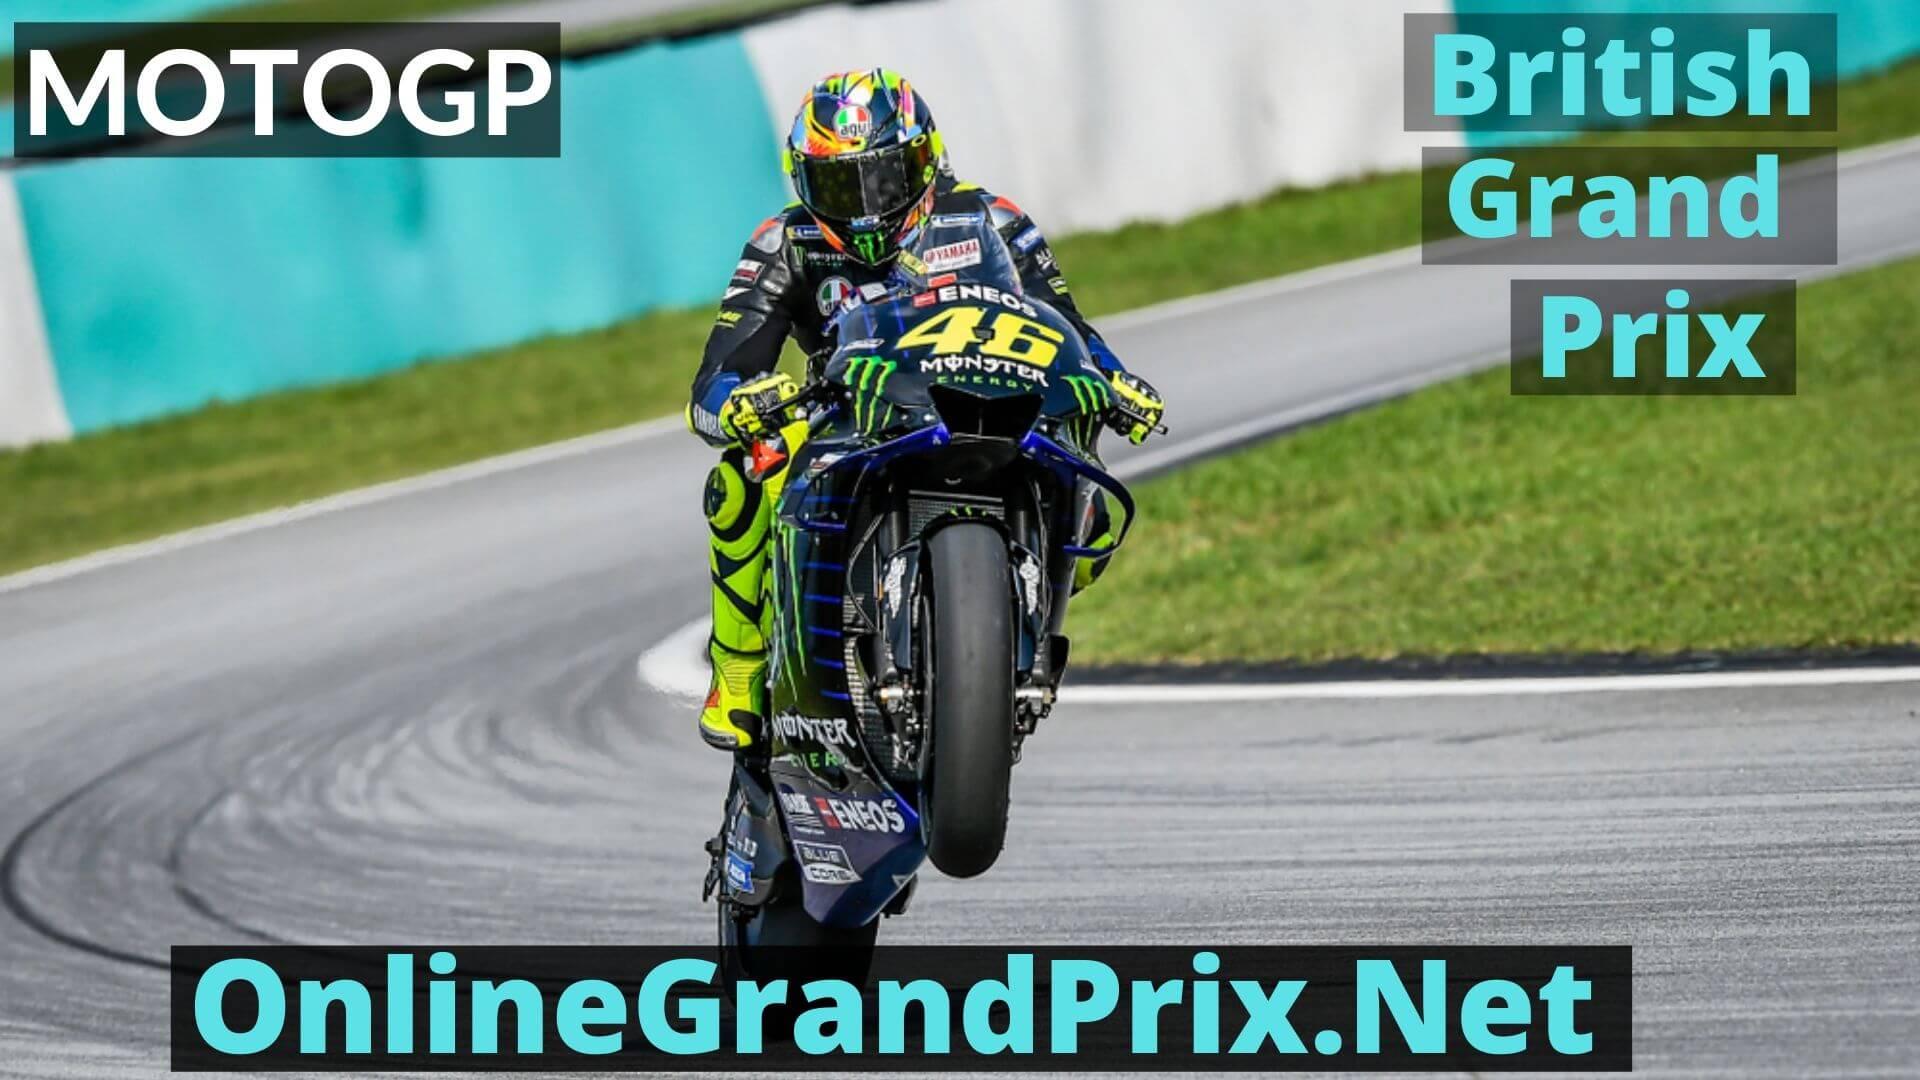 British Grand Prix Live Stream 2020 | MotoGP